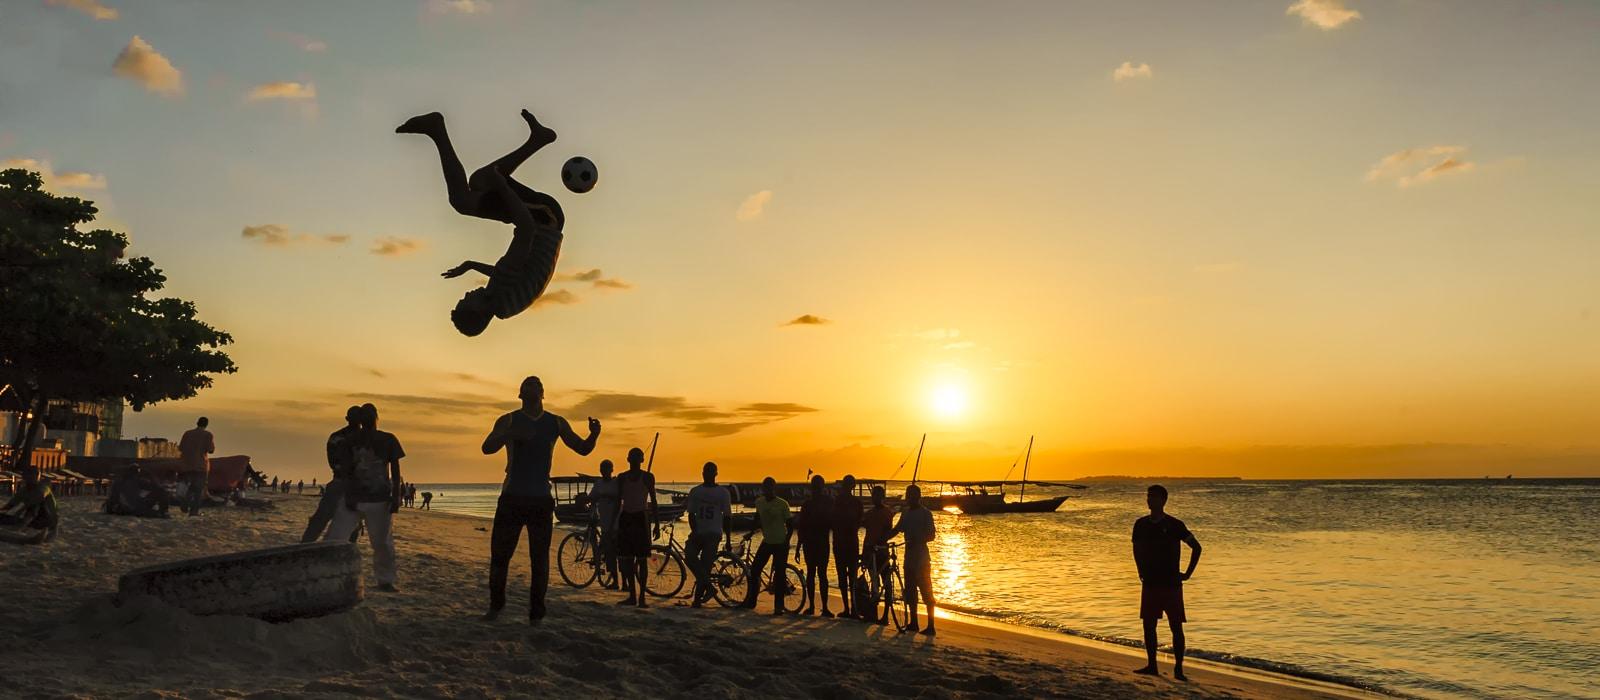 Voyage organisé en petit groupe - plage Bwejju Zanzibar - Tanzanie - Agence de voyage Les Routes du Monde